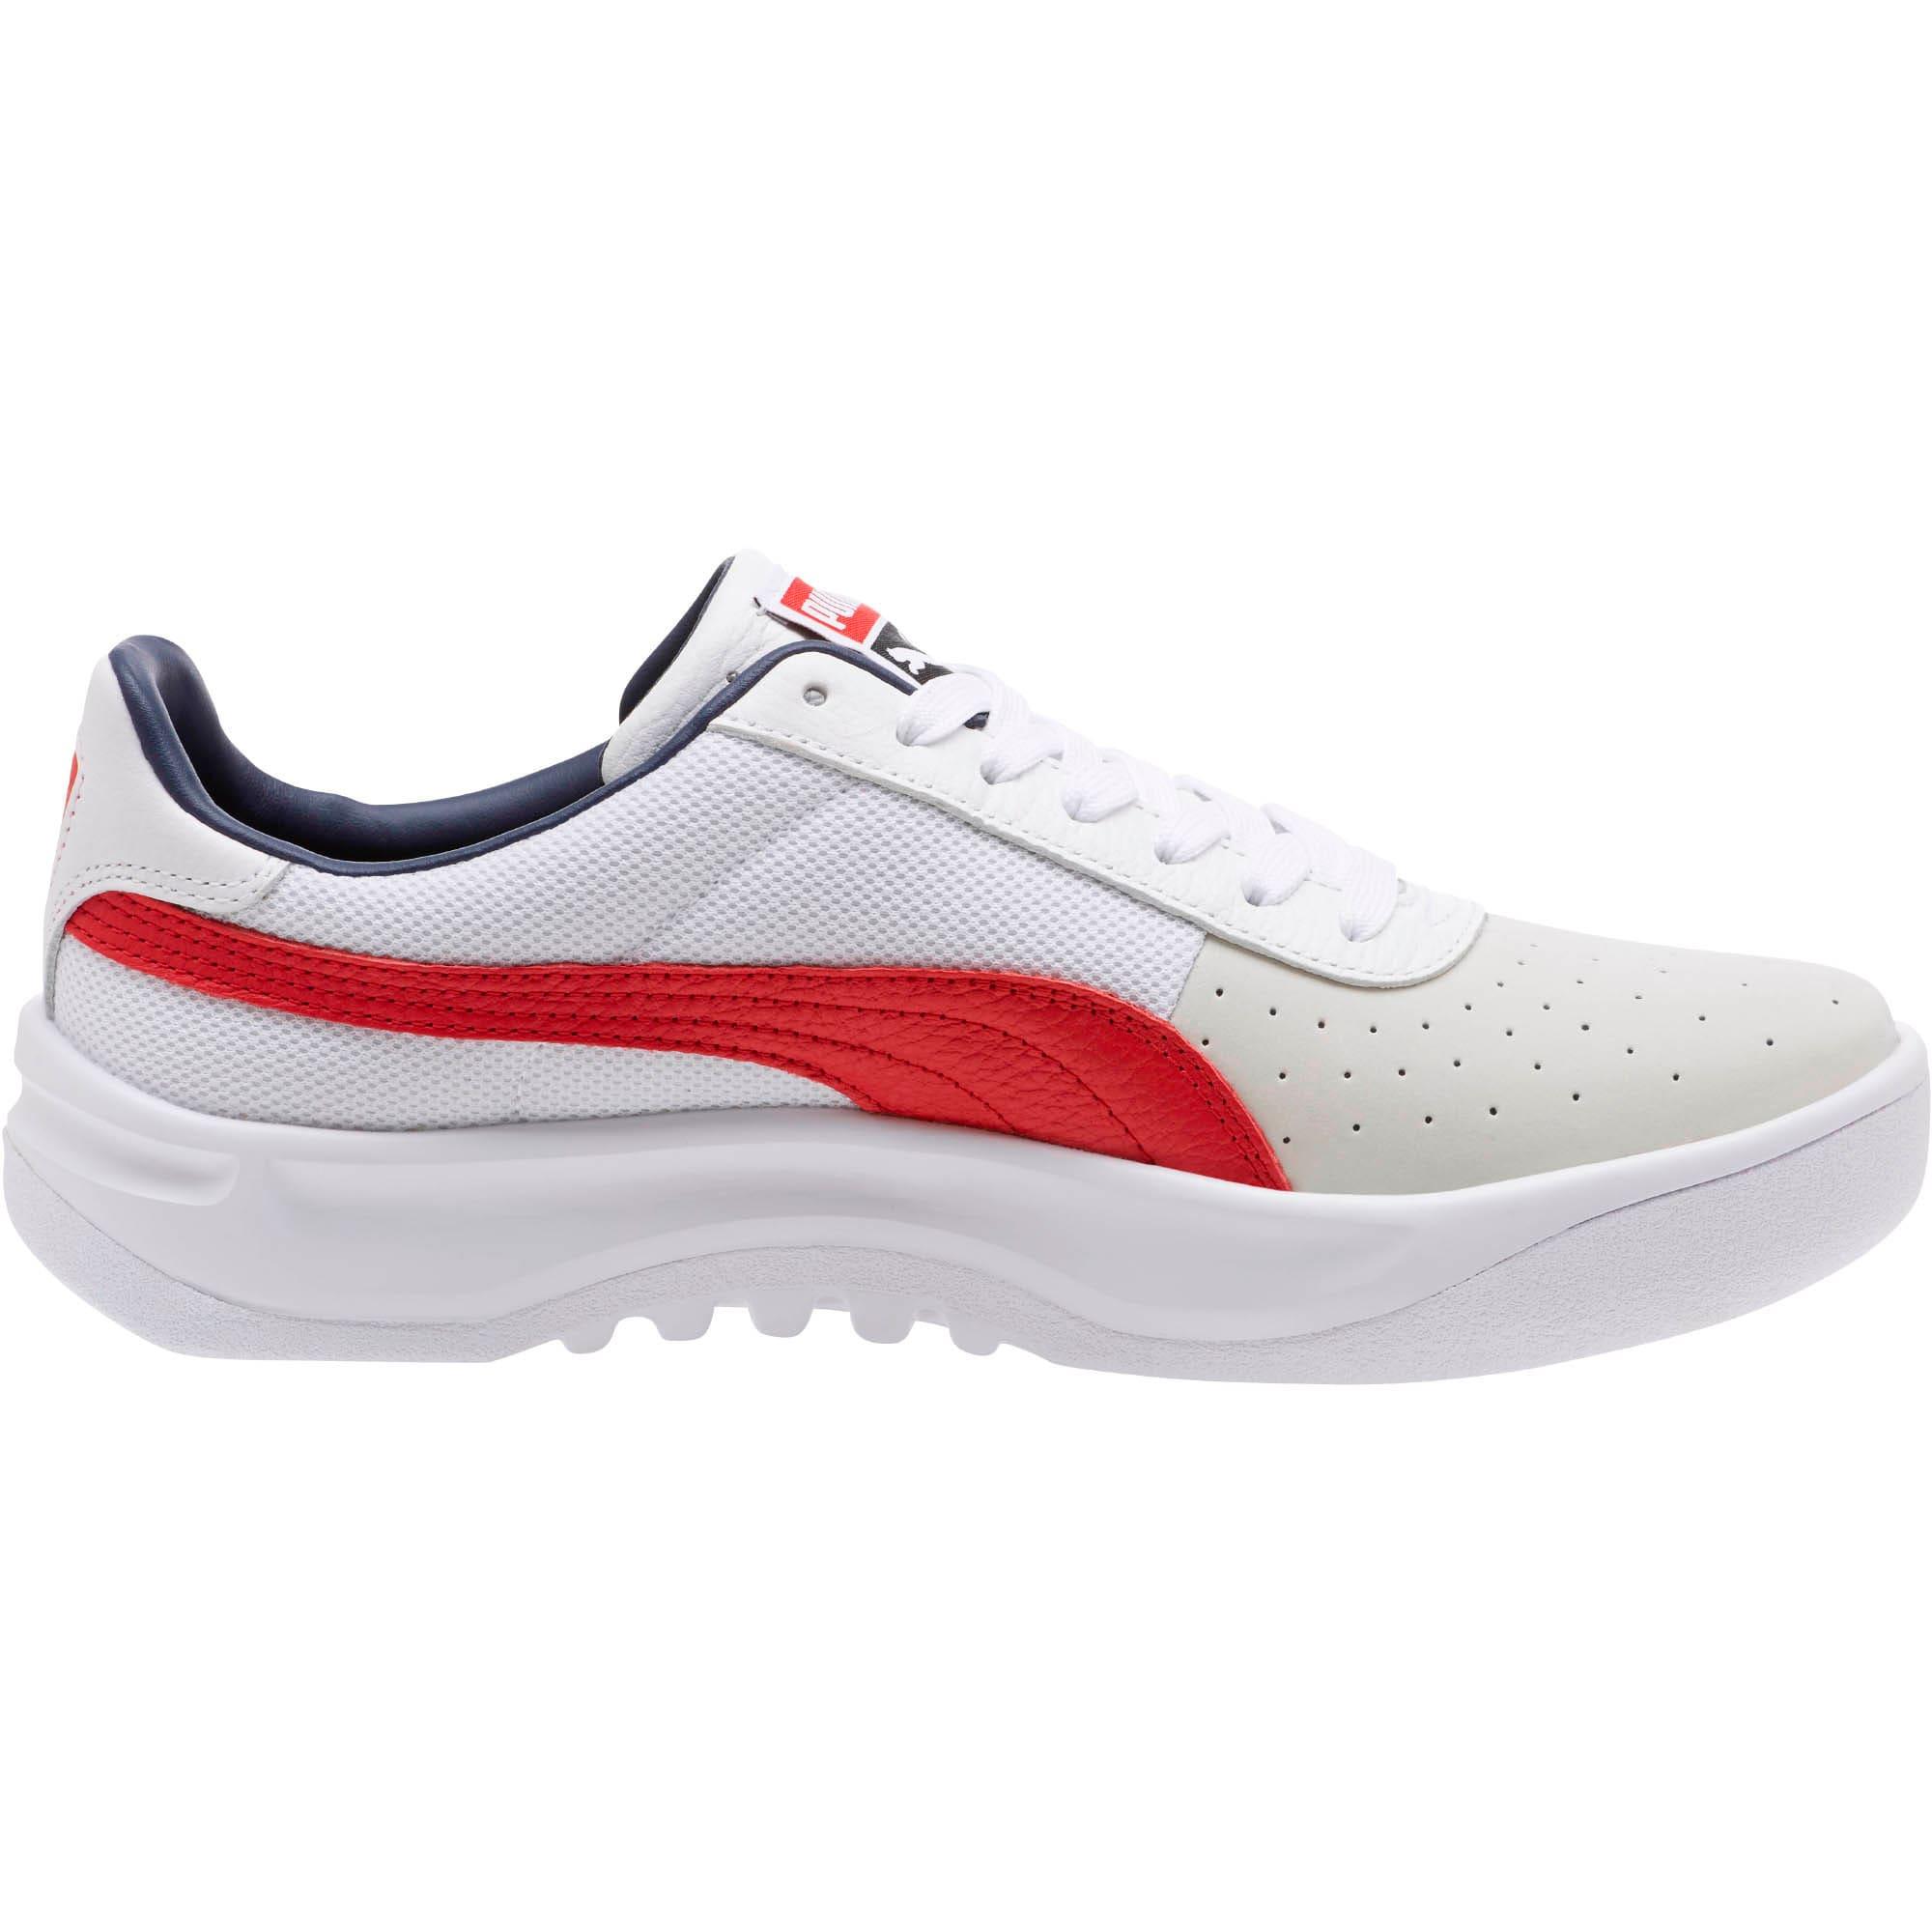 Thumbnail 3 of California Casual Sneakers, P White-RibbonRed-P White, medium